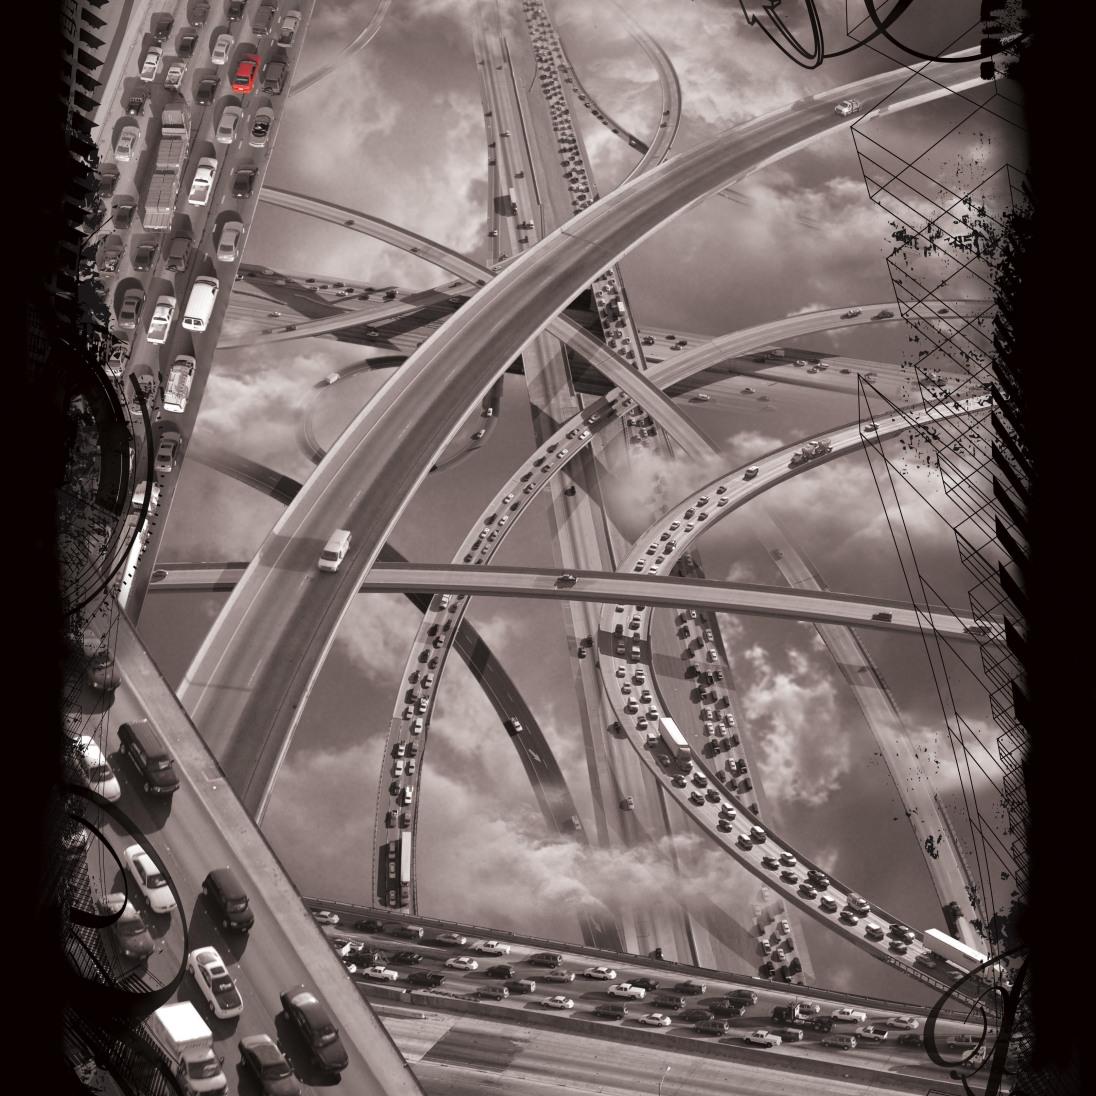 Freeway Tangle by Doug McCulloh